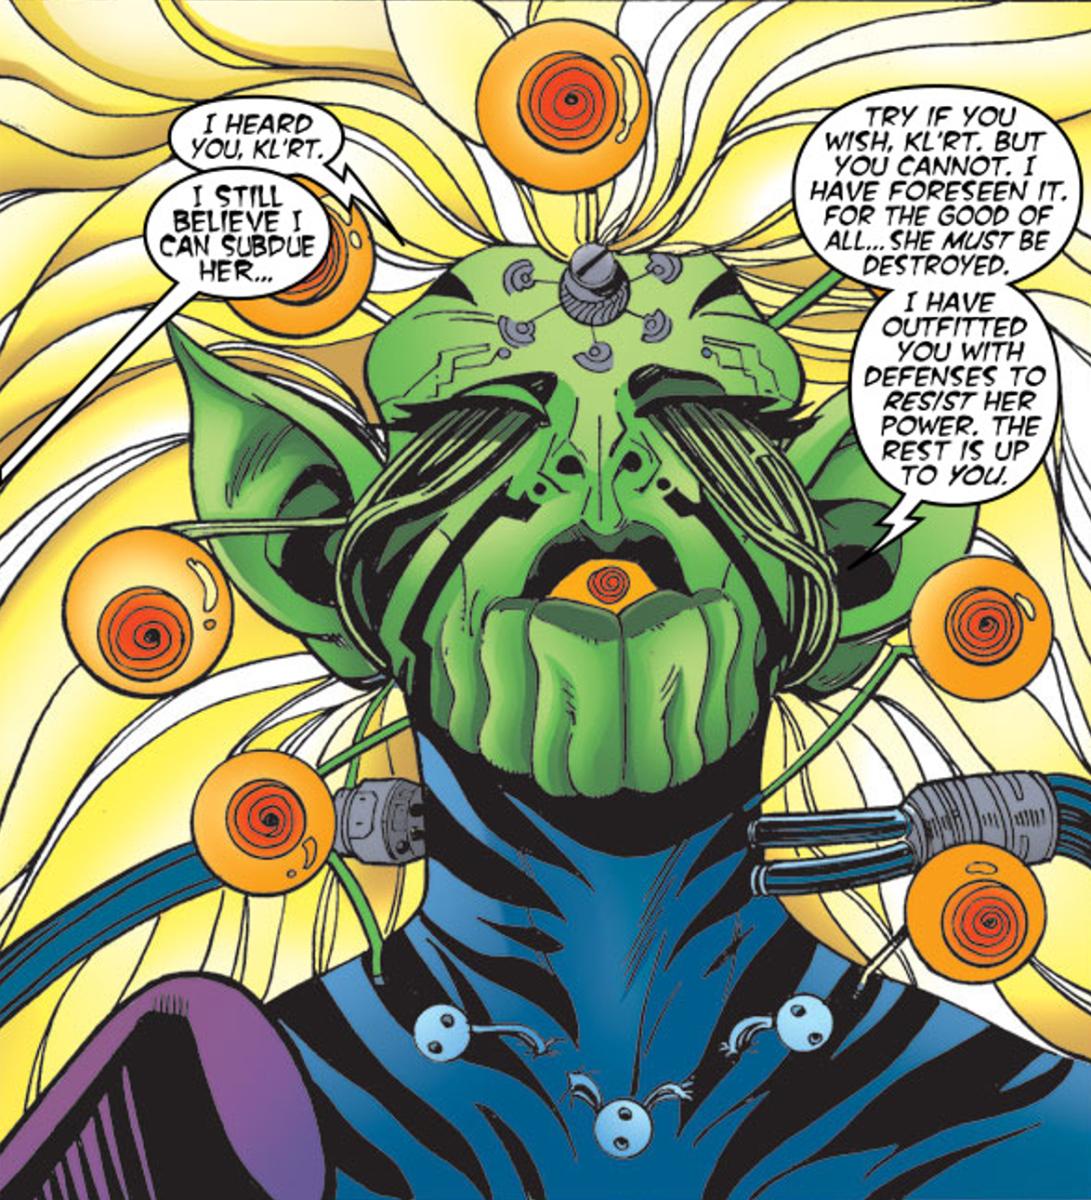 Intelligencis - The Skrull Supreme Intelligence